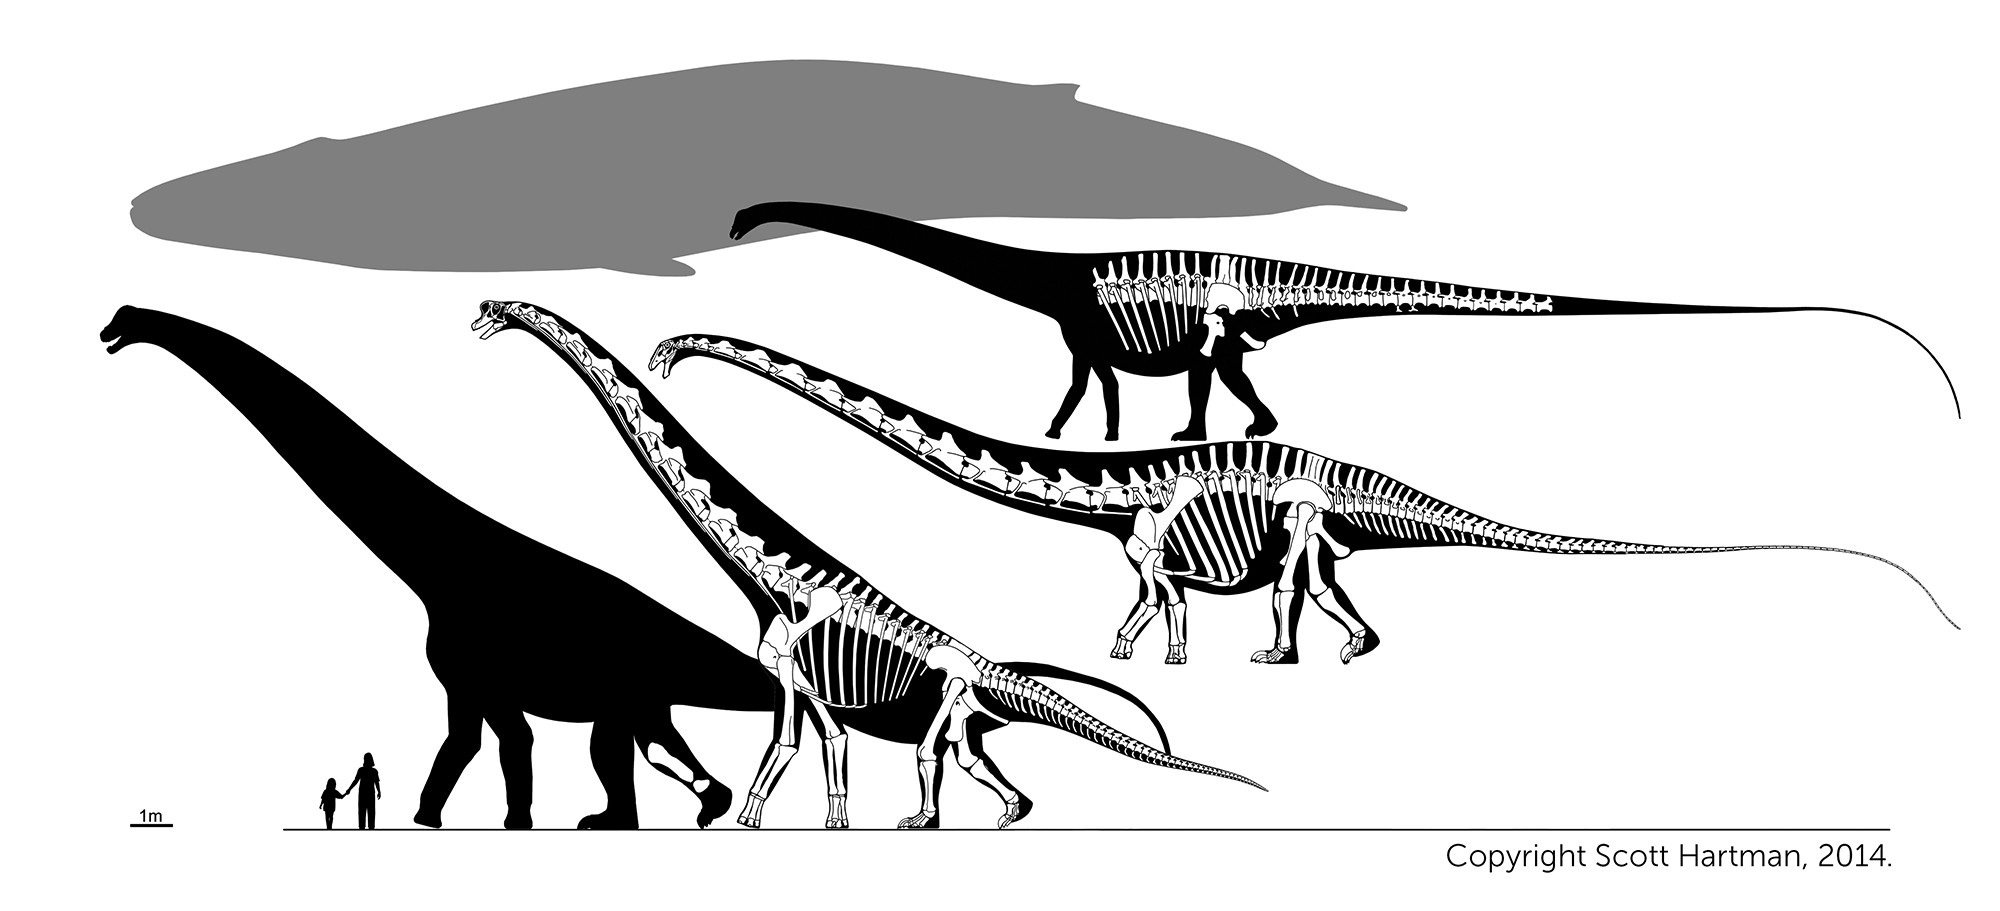 Dinos from left to right: Giant Alamosaurus  tibia,  Giraffatitan (HMN SII),  Supersaurus  (WDC) and  Diplodocus  (NMMNH).